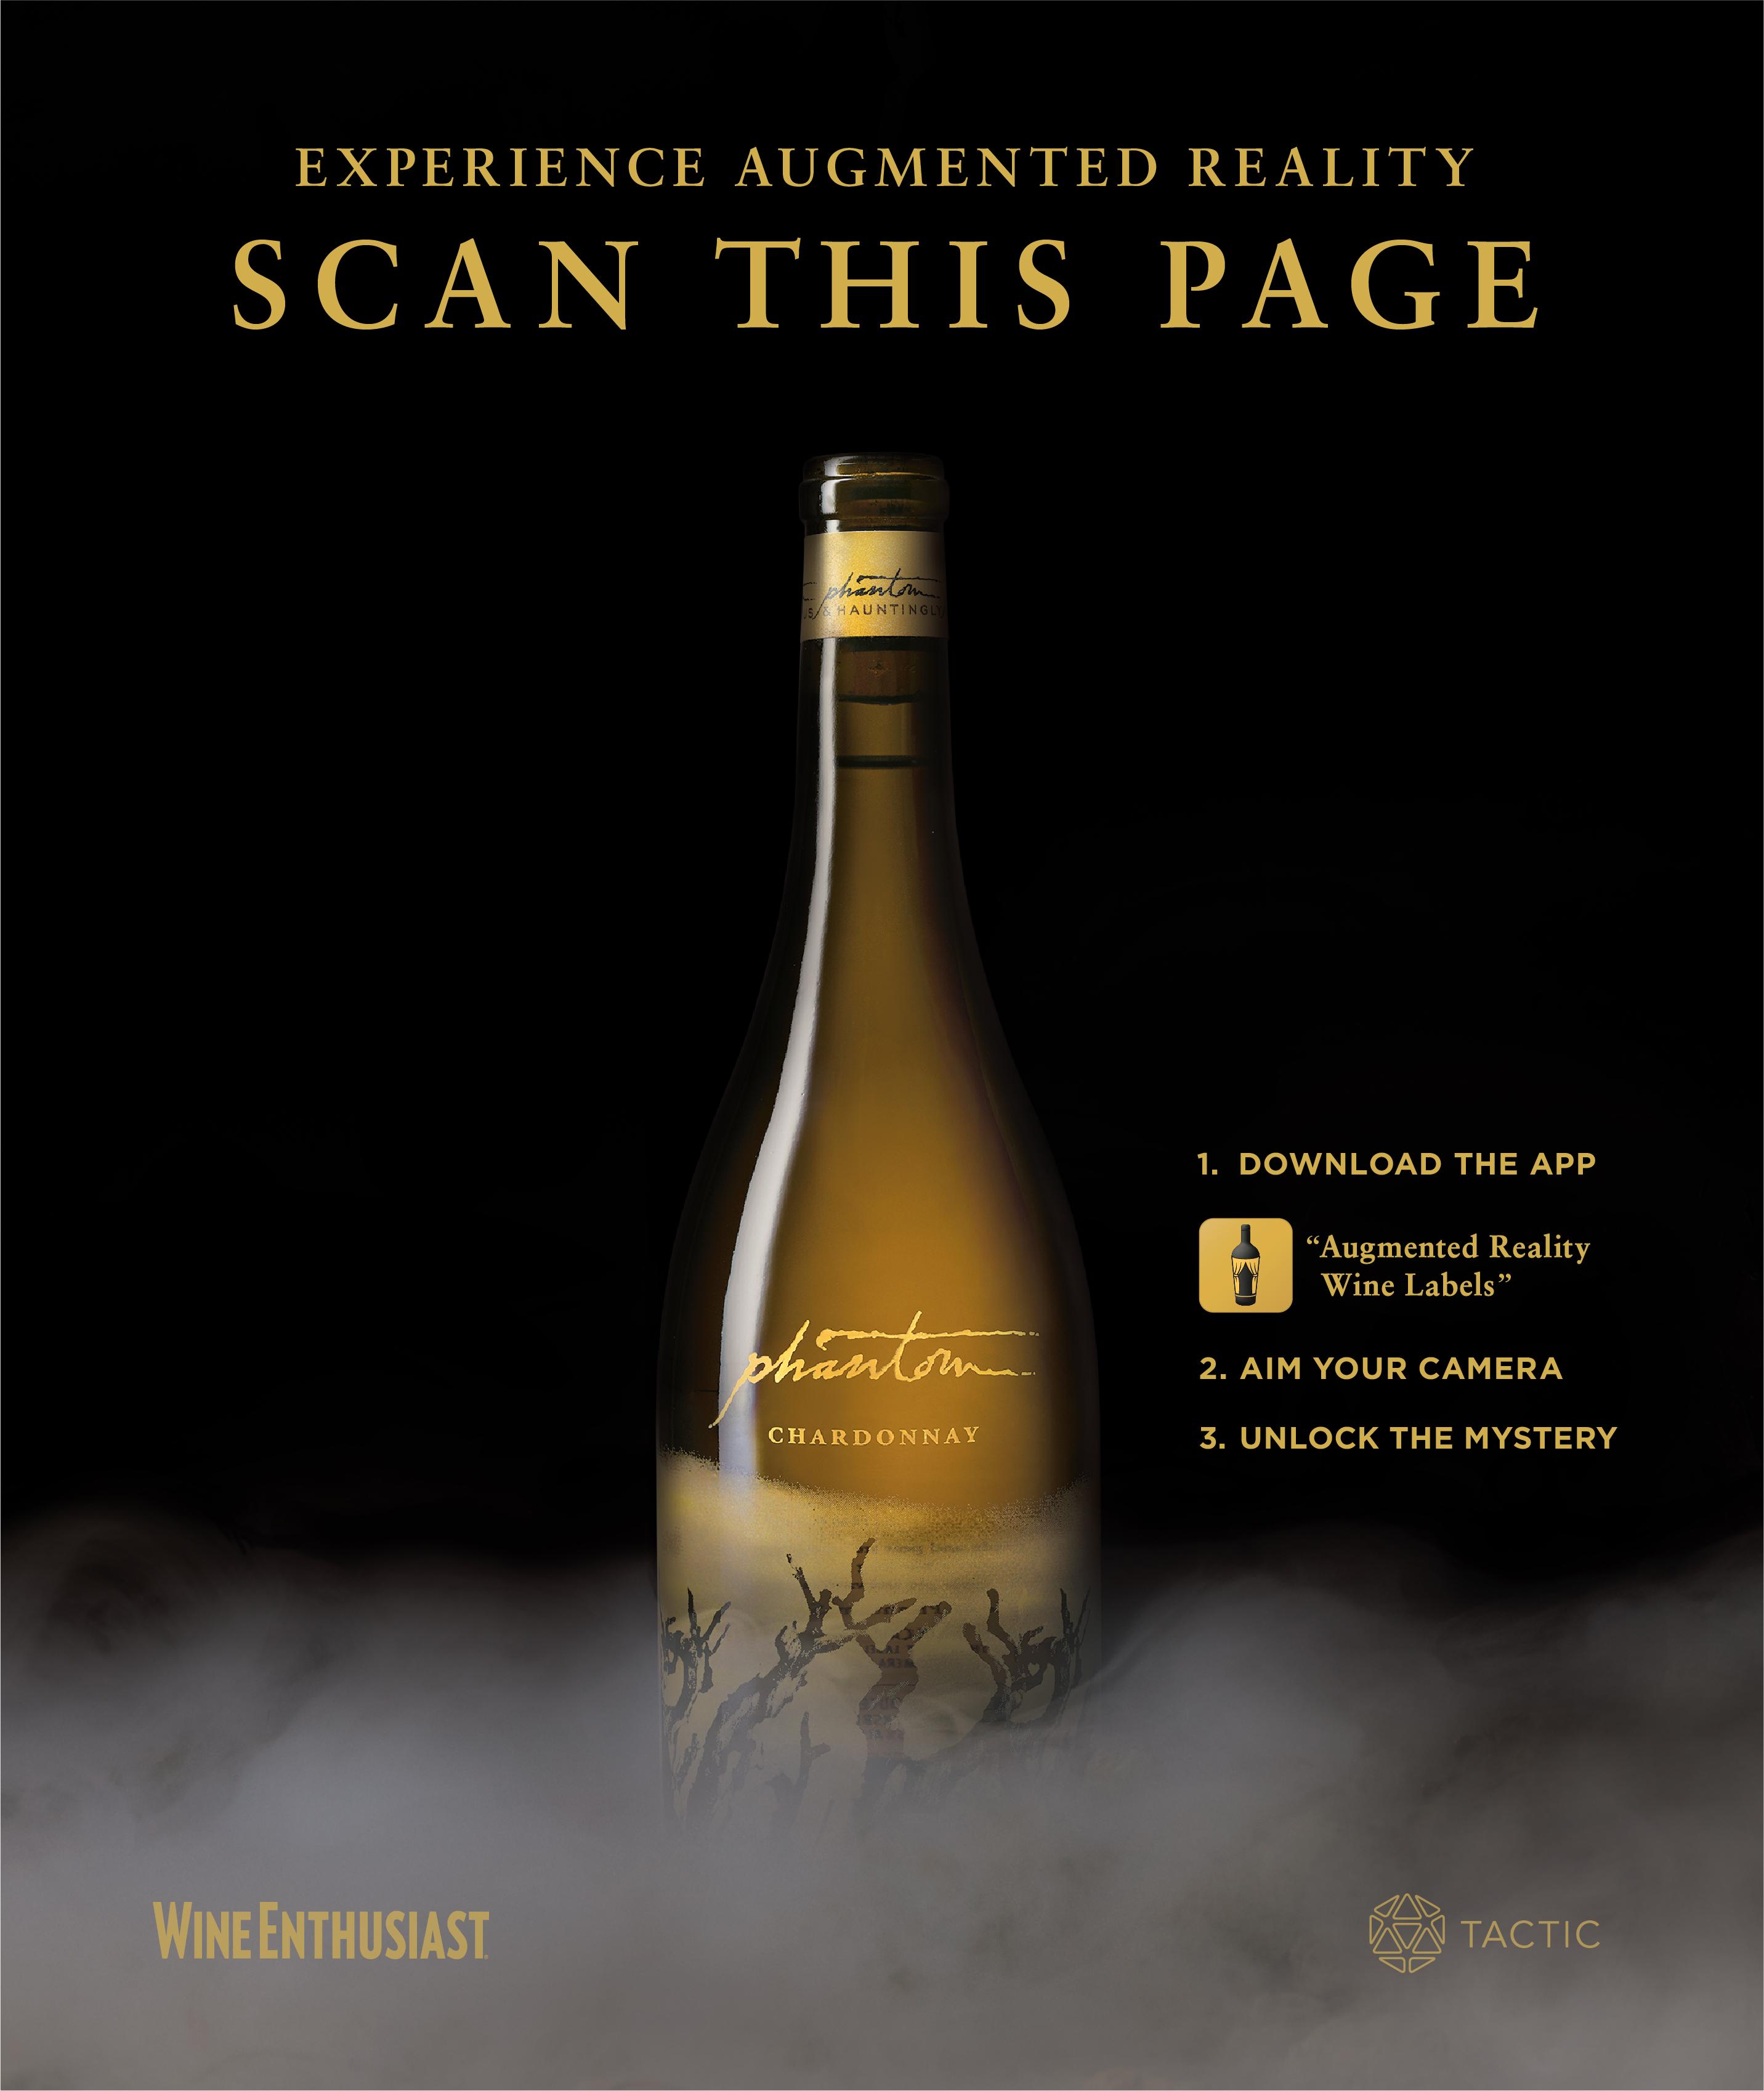 Phantom augmented reality wine bottle